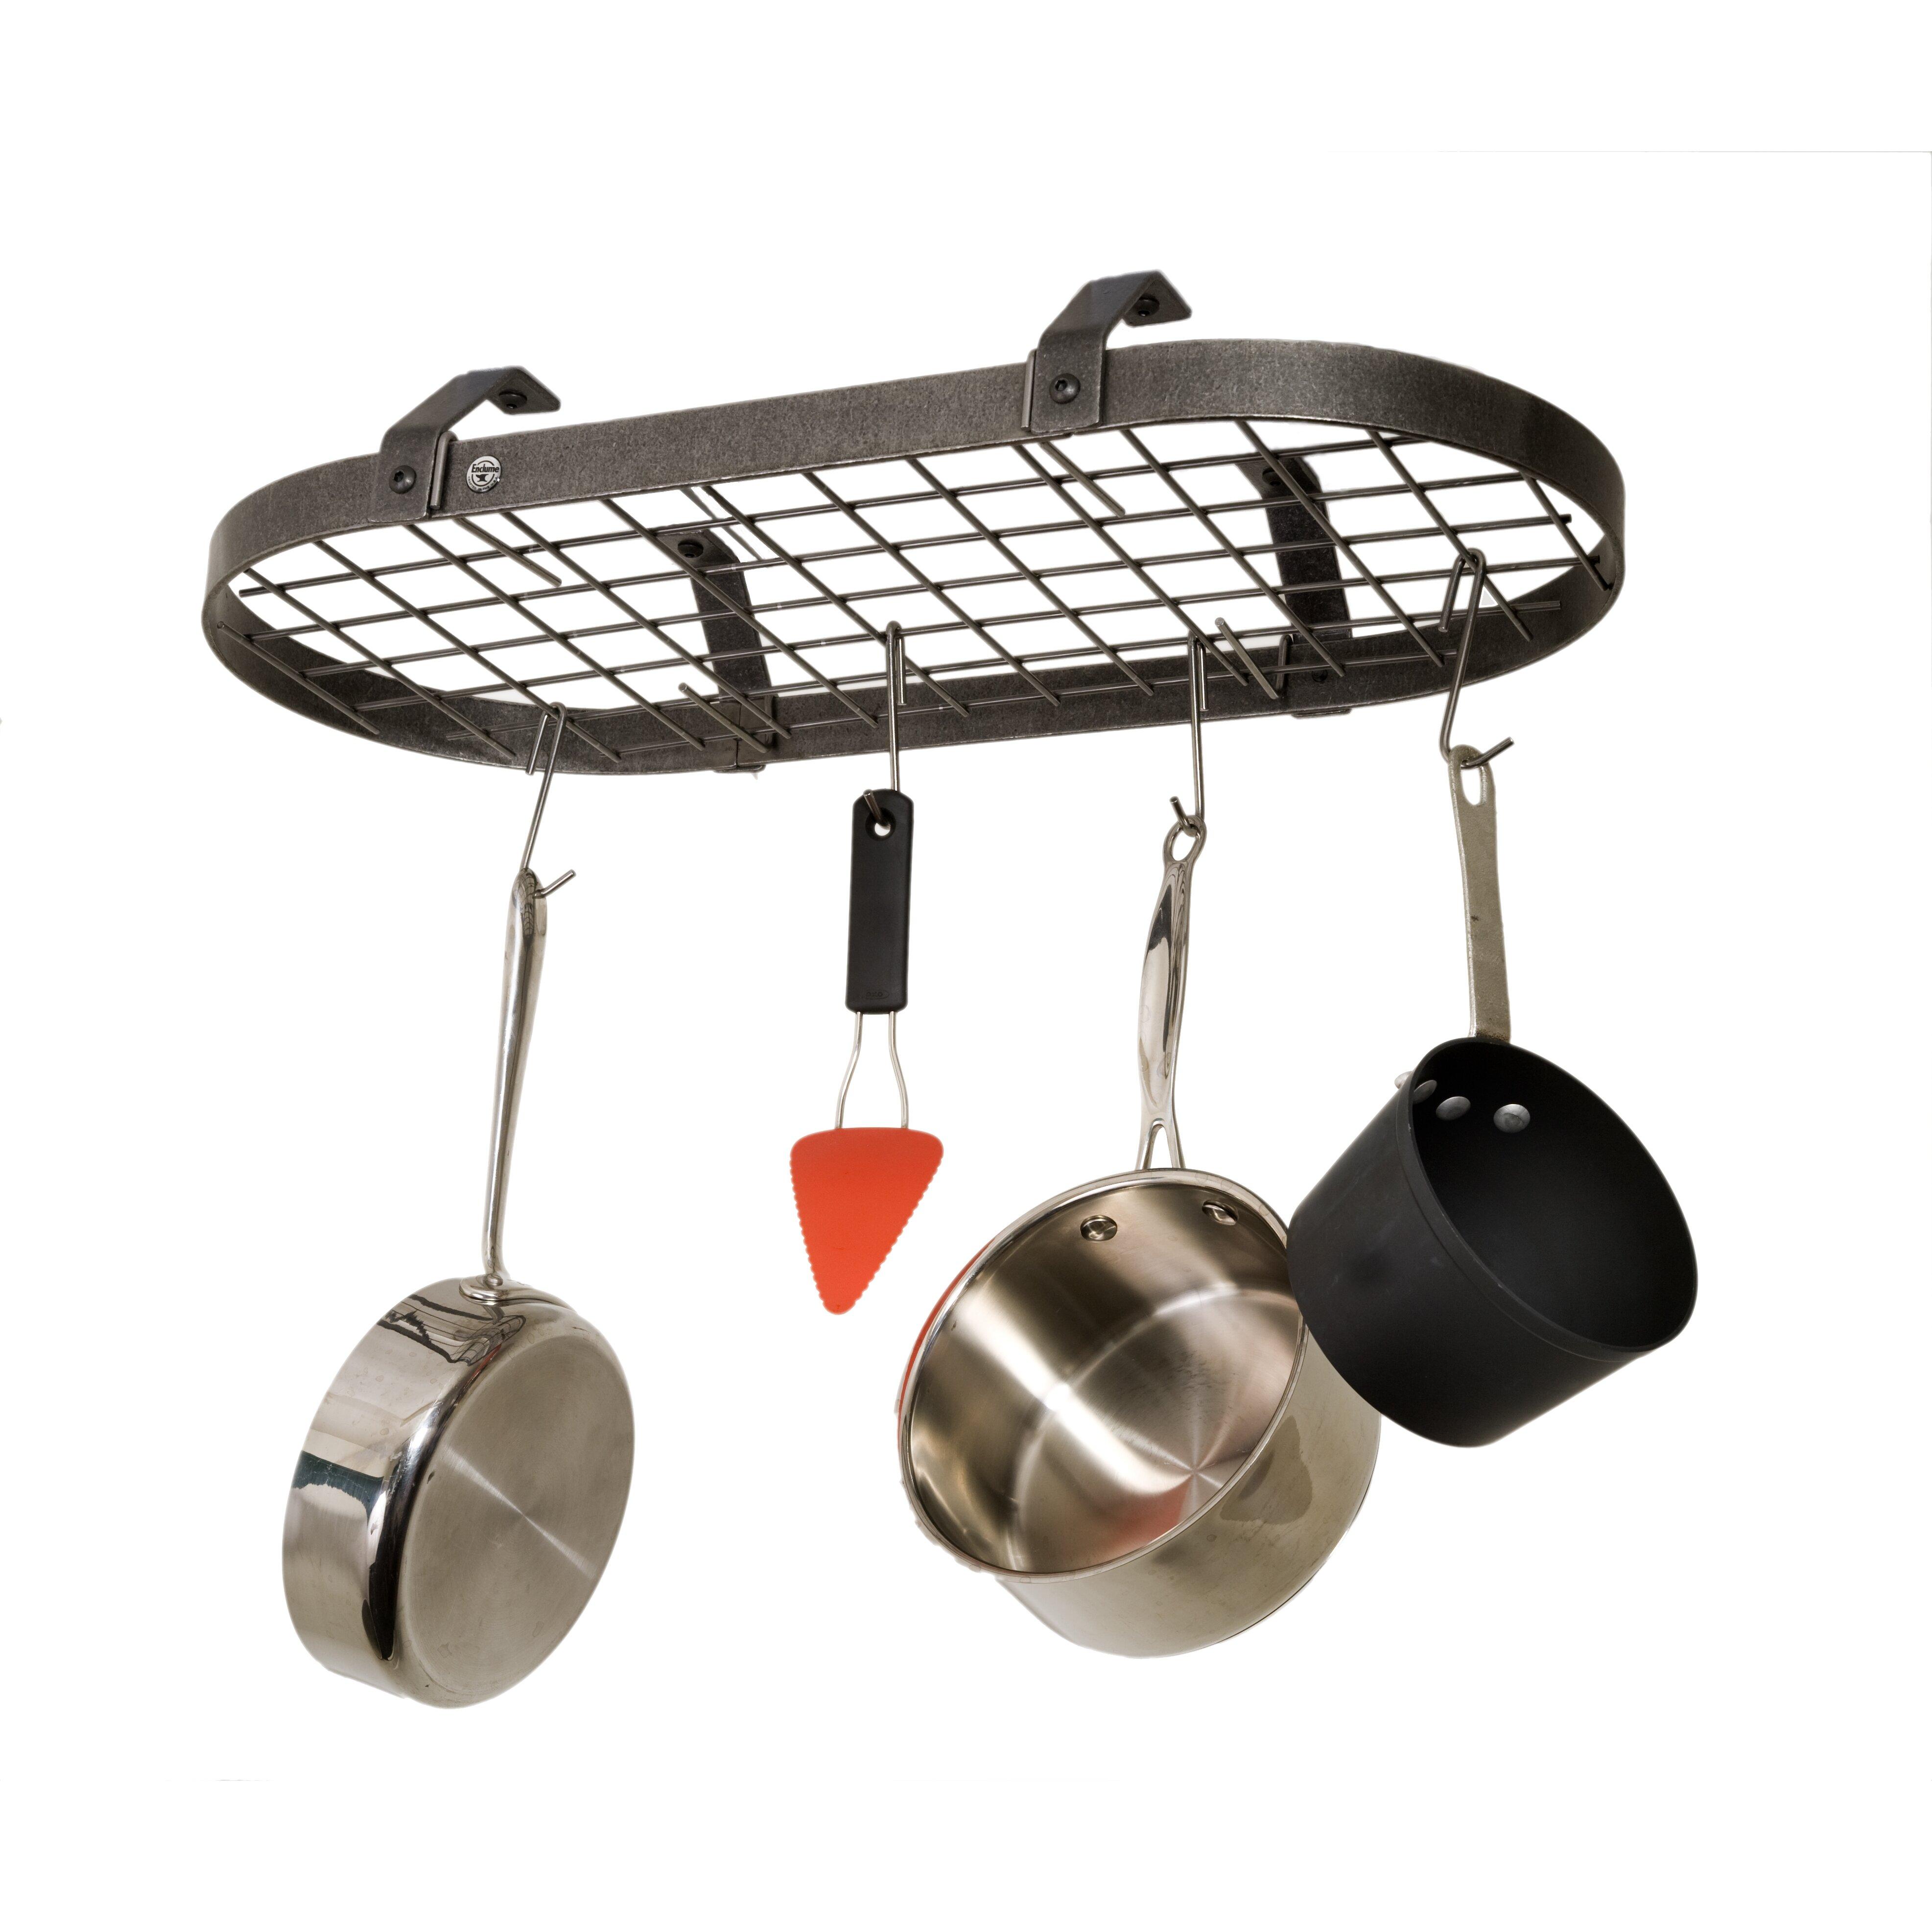 Pot Rack: Enclume Low Ceiling Oval Hanging Pot Rack